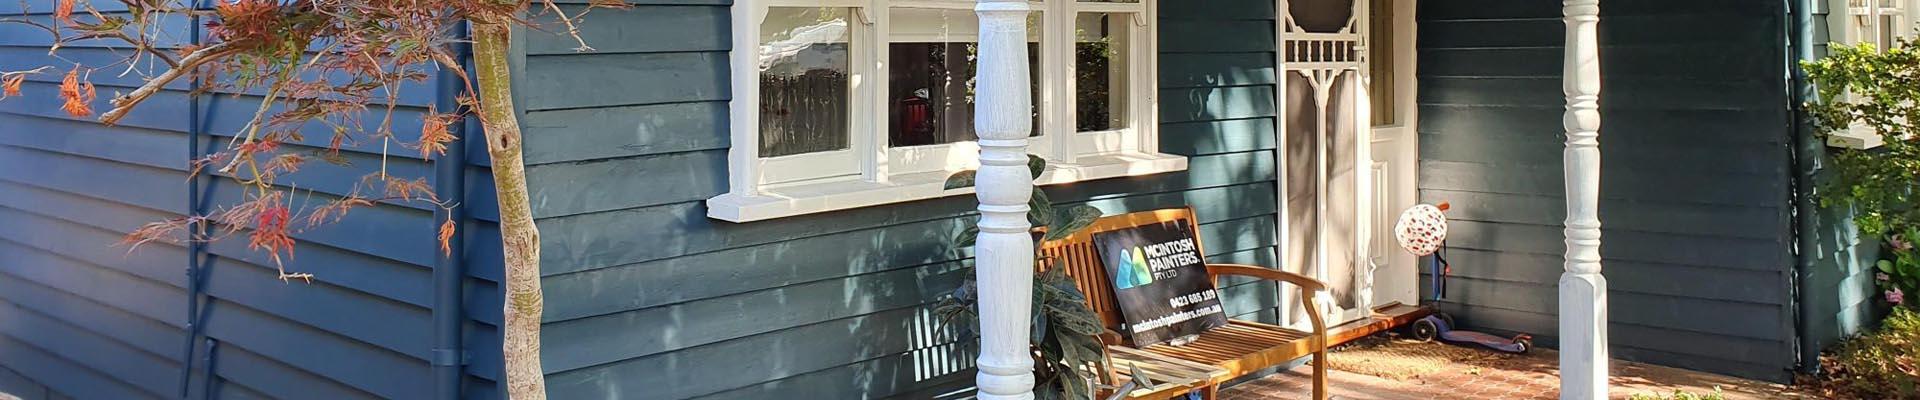 Mcintosh Painters Exterior.